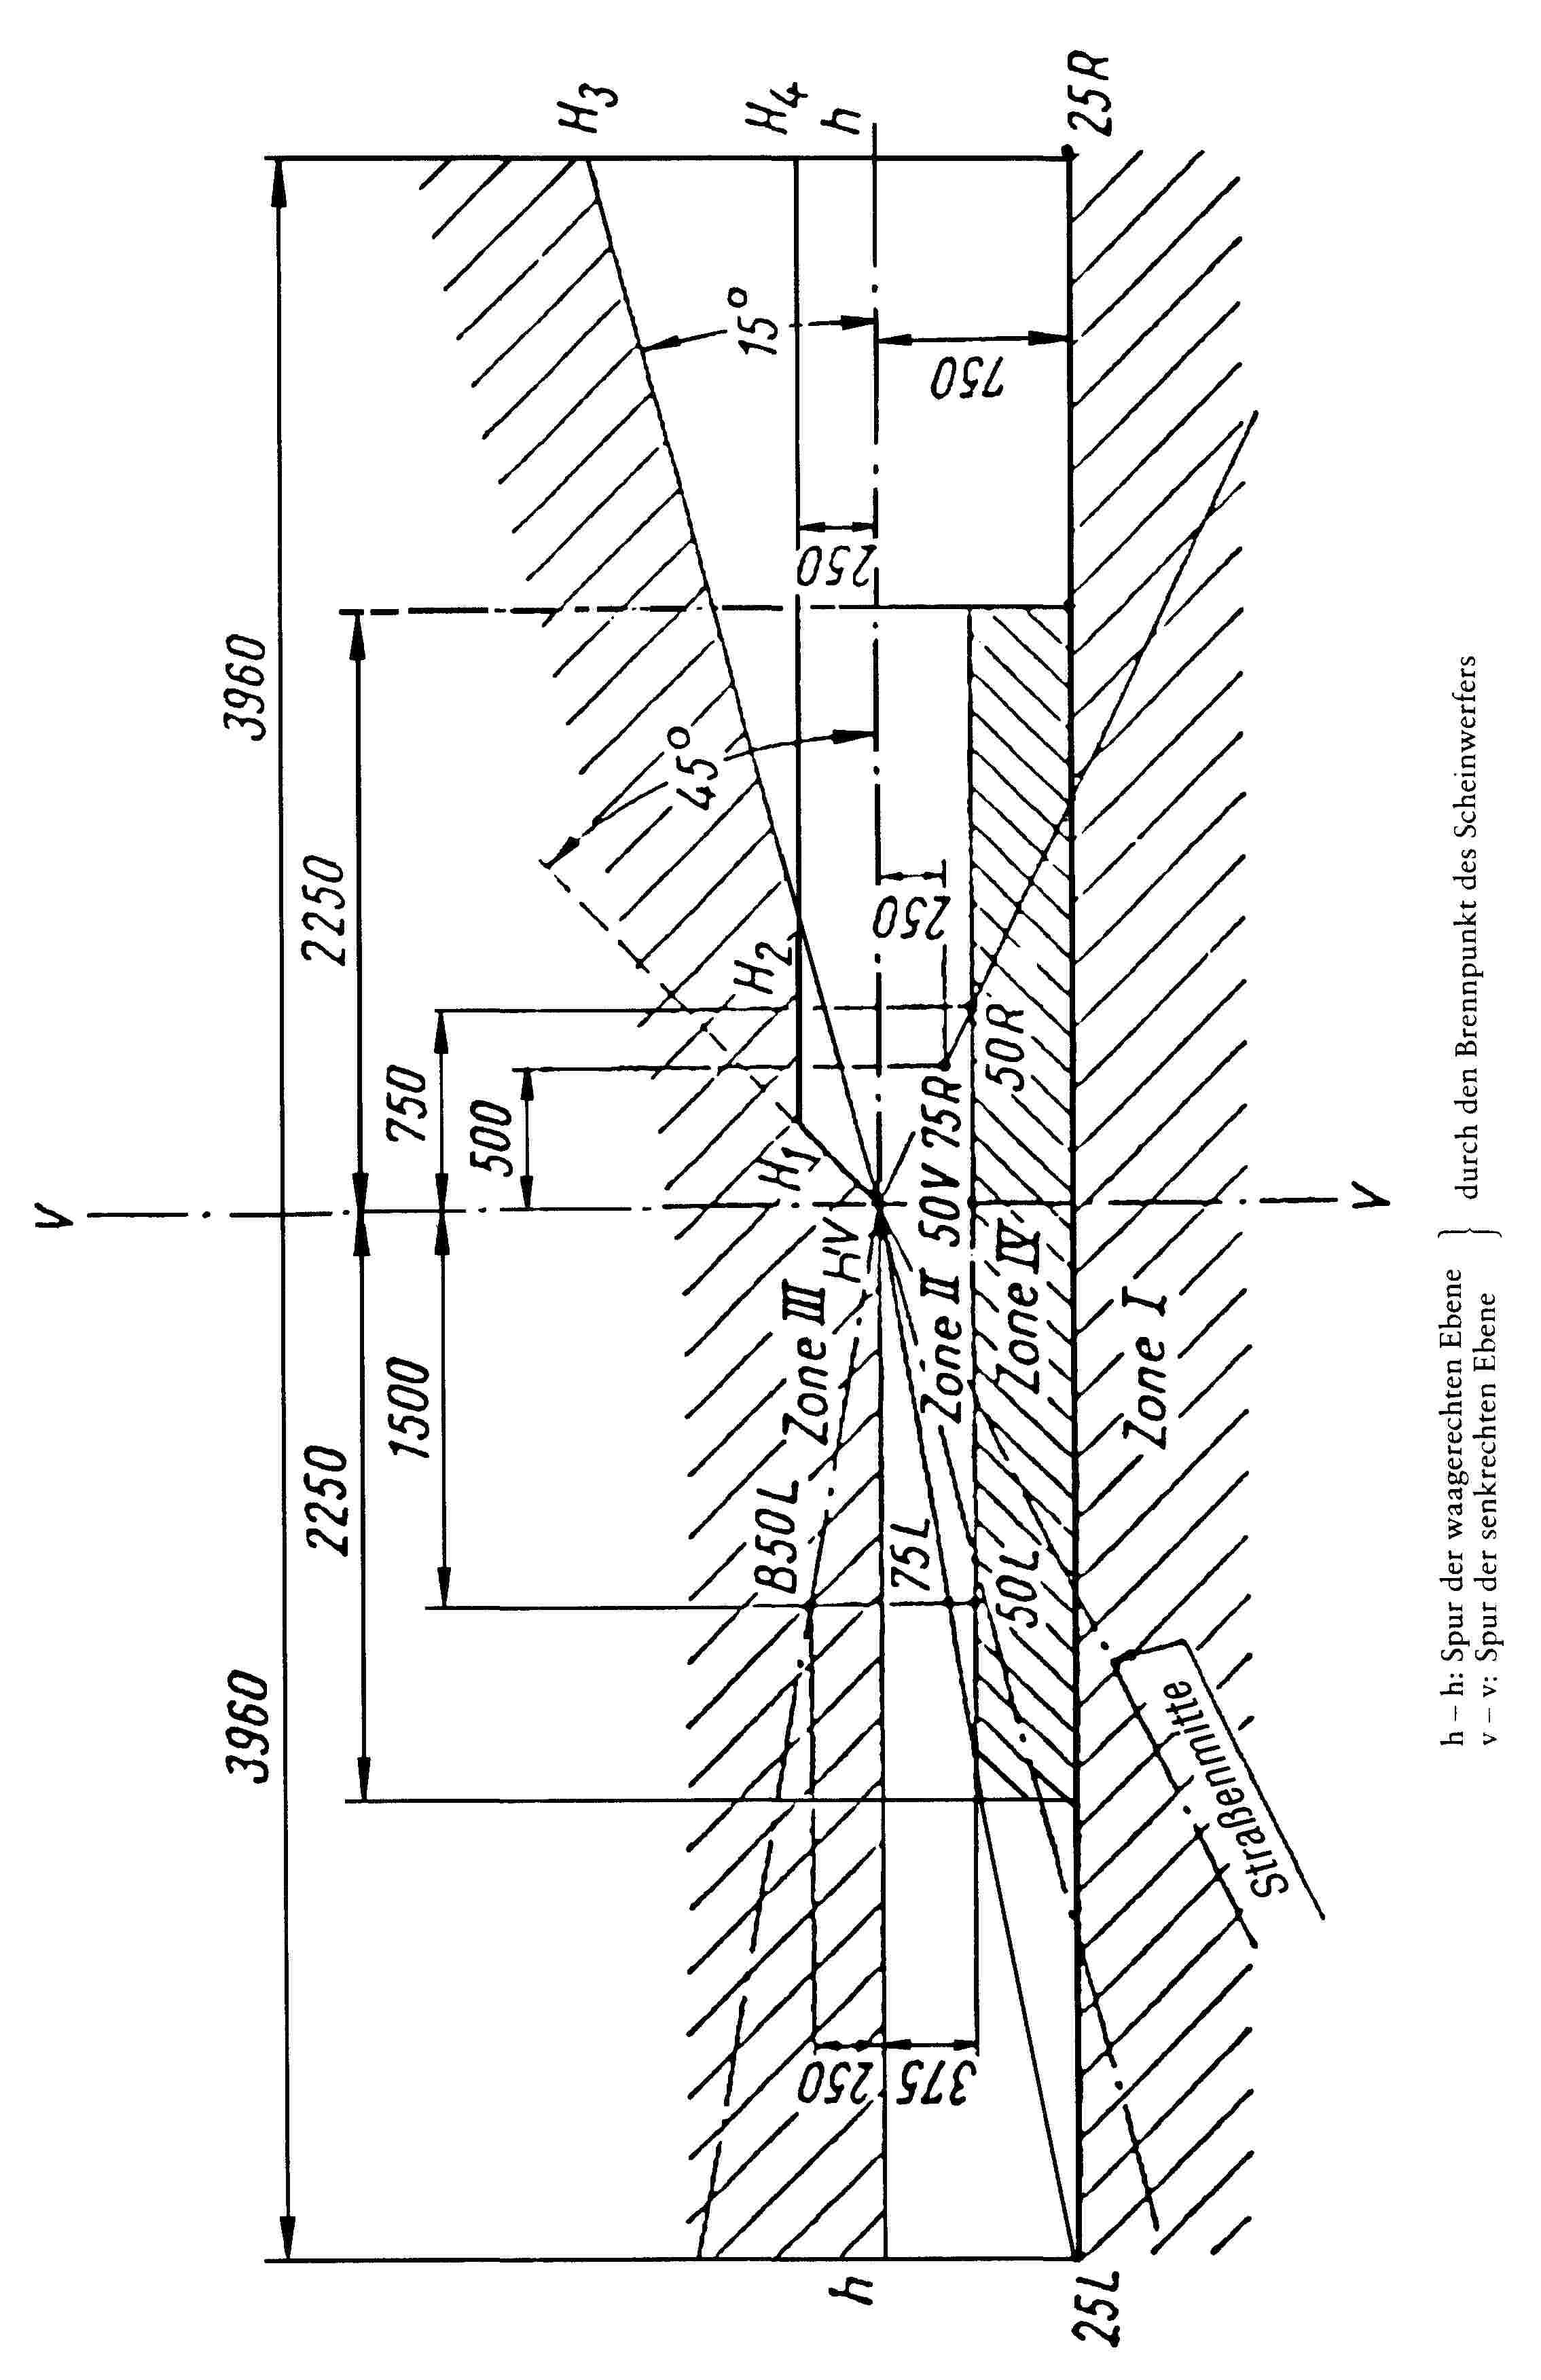 Fein 2 Wege Beleuchtungsdiagramm Ideen - Schaltplan Serie Circuit ...